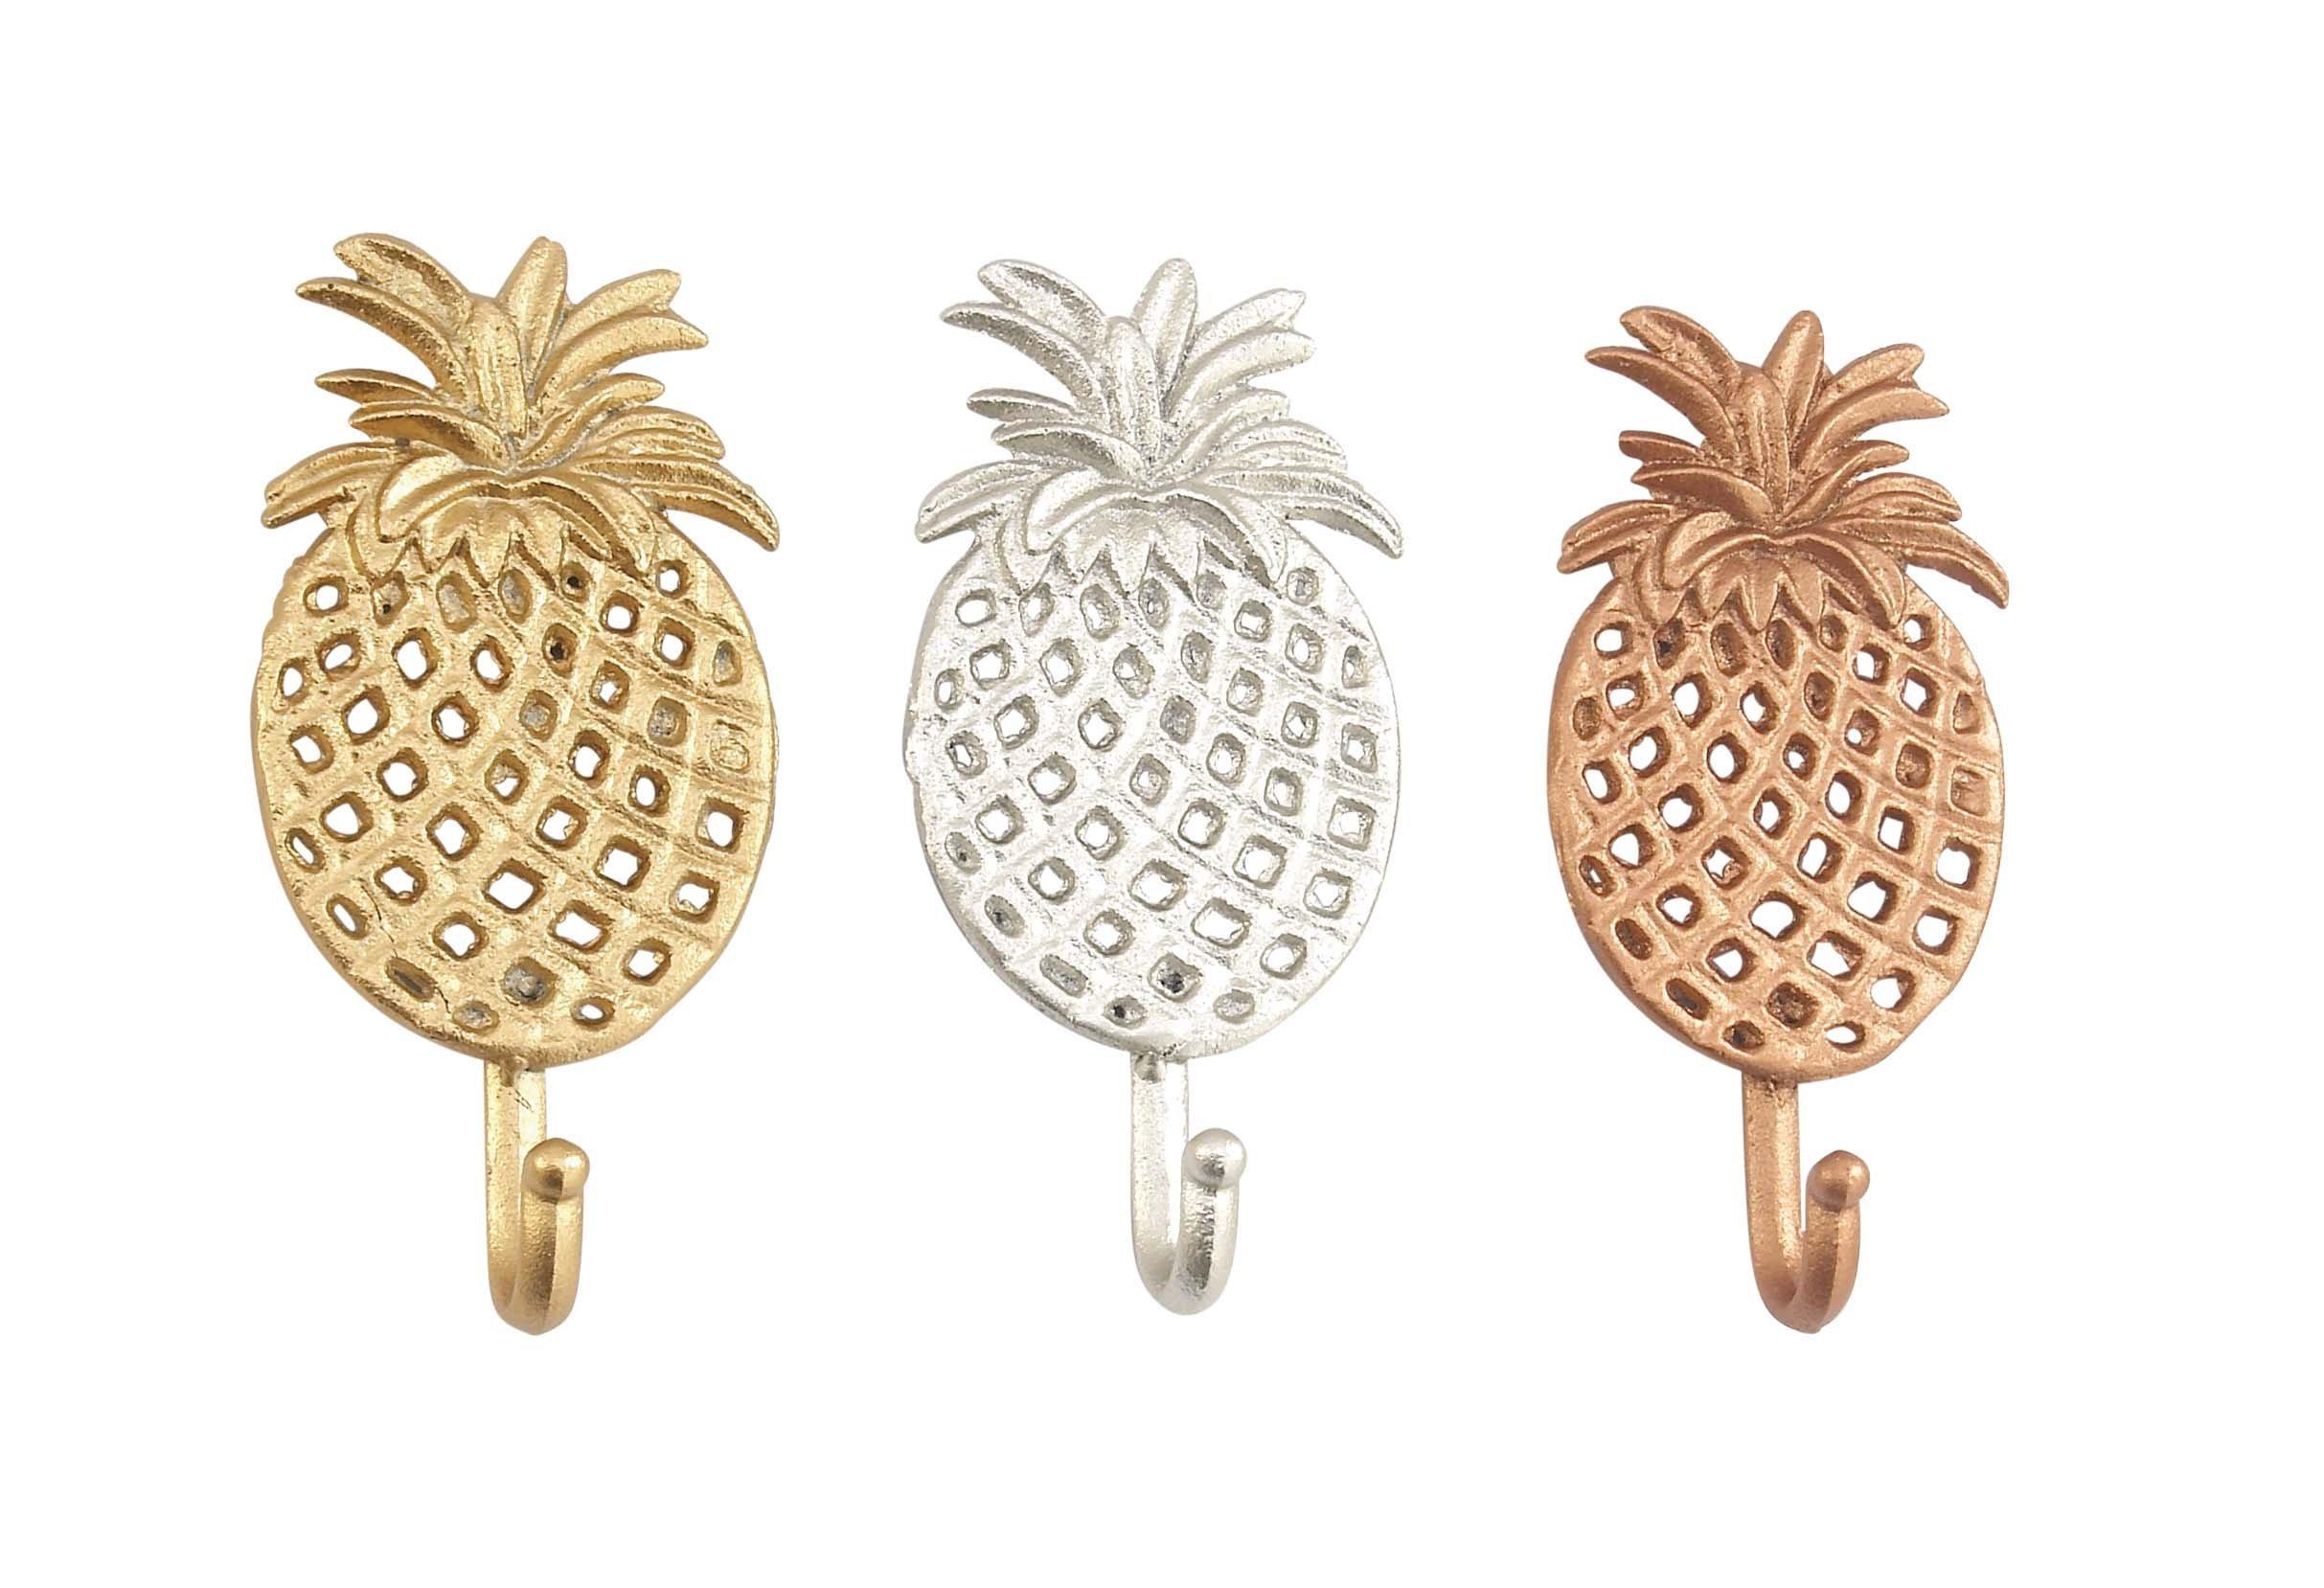 Deco 79 59420 Metallic Pineapple-Inspired Wall Hooks (Set of 3), Gold/Silver/Bronze